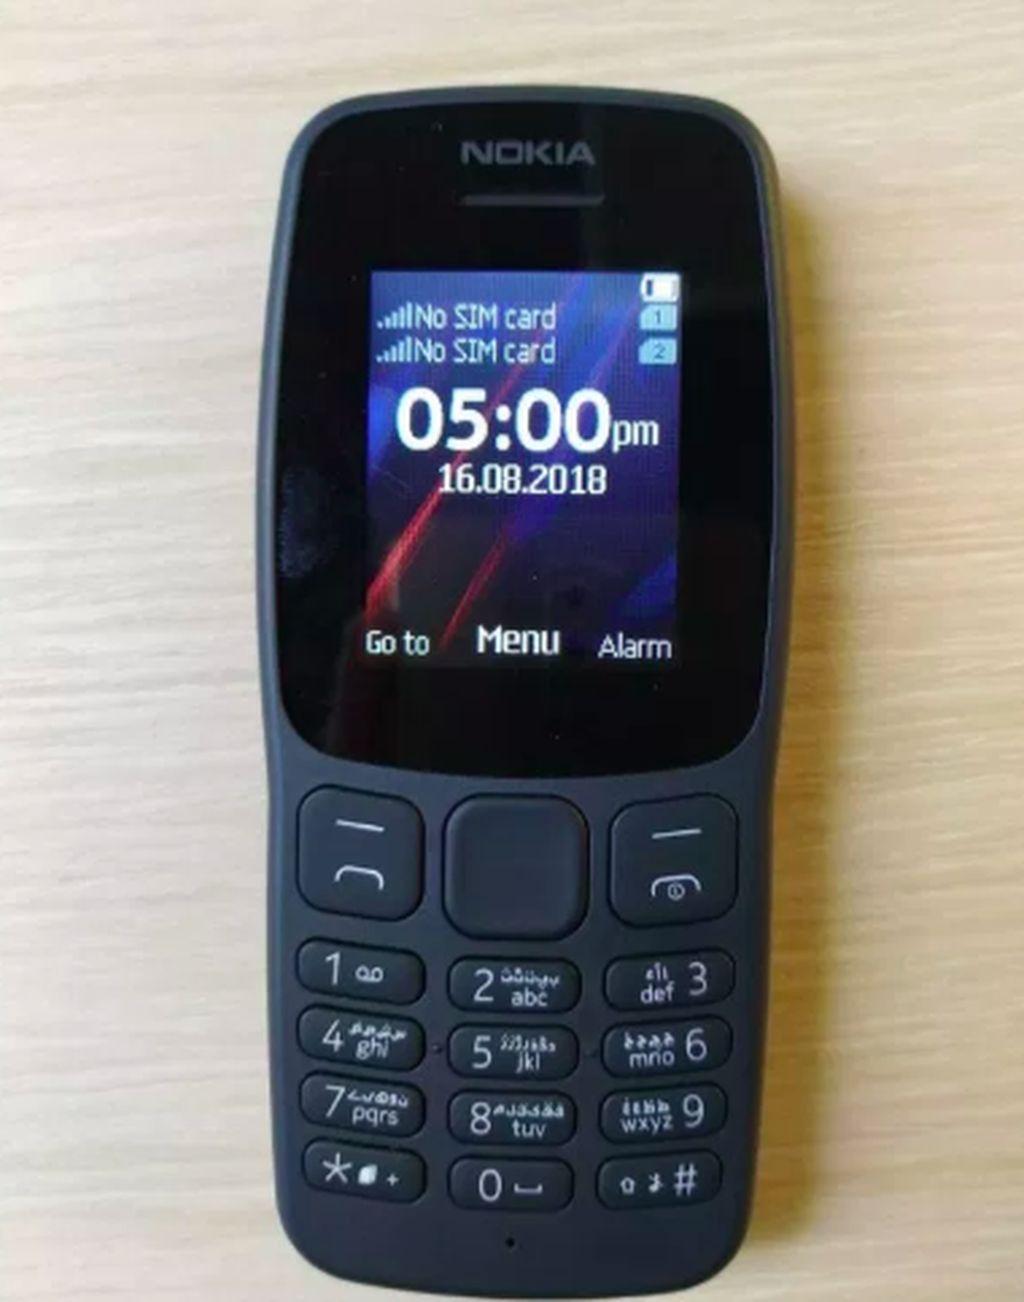 Nokia 106 ini adalah perbaikan dari ponsel dengan merek sama yang pernah rilis pada tahun 2013. Fiturnya kurang lebih sama saja, cuma baterainya lebih tahan lama. Foto: Nokia